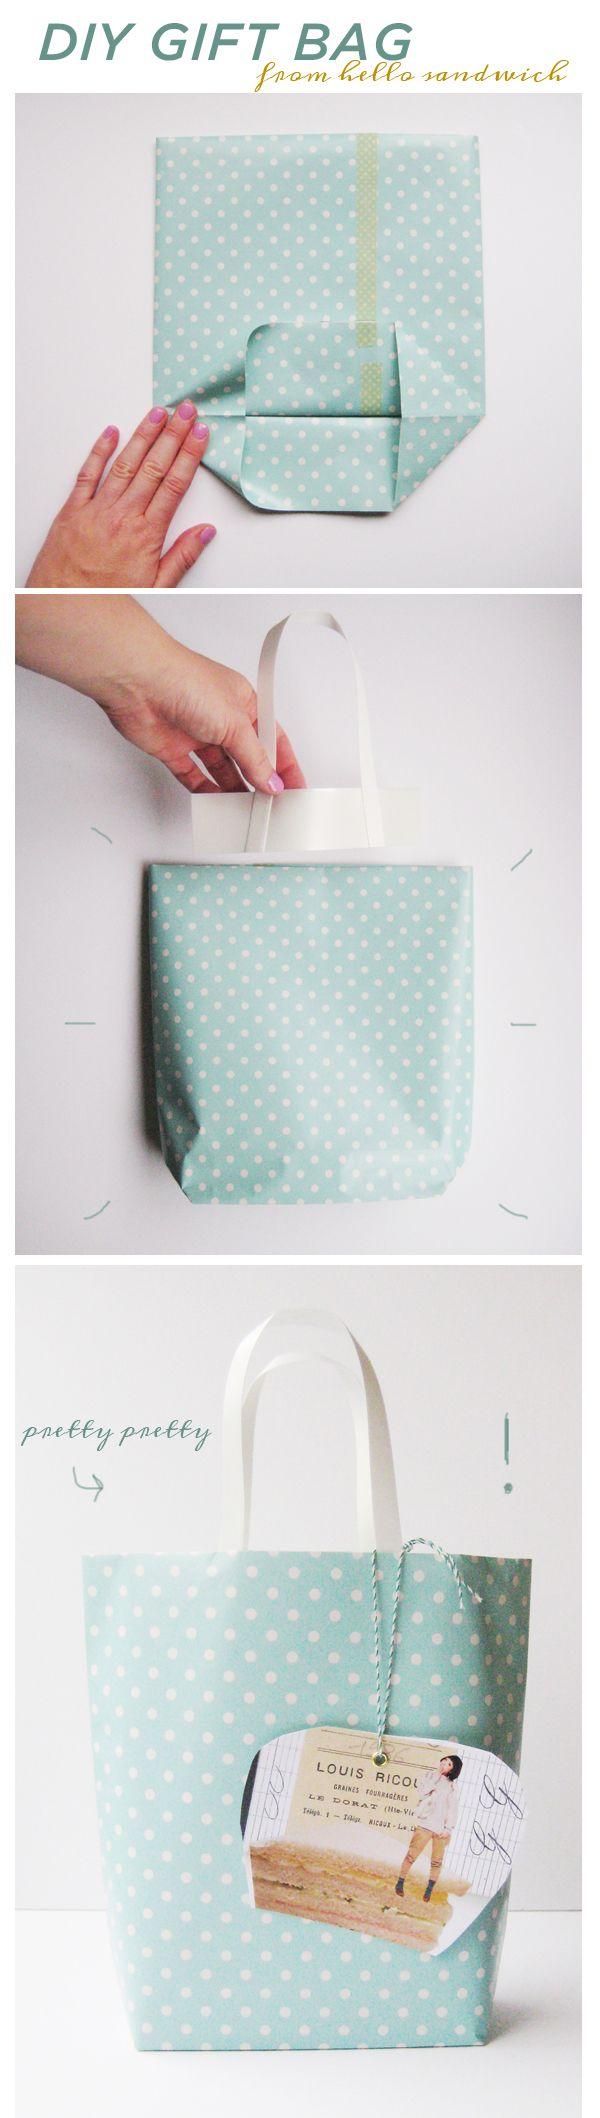 diy gift bag.